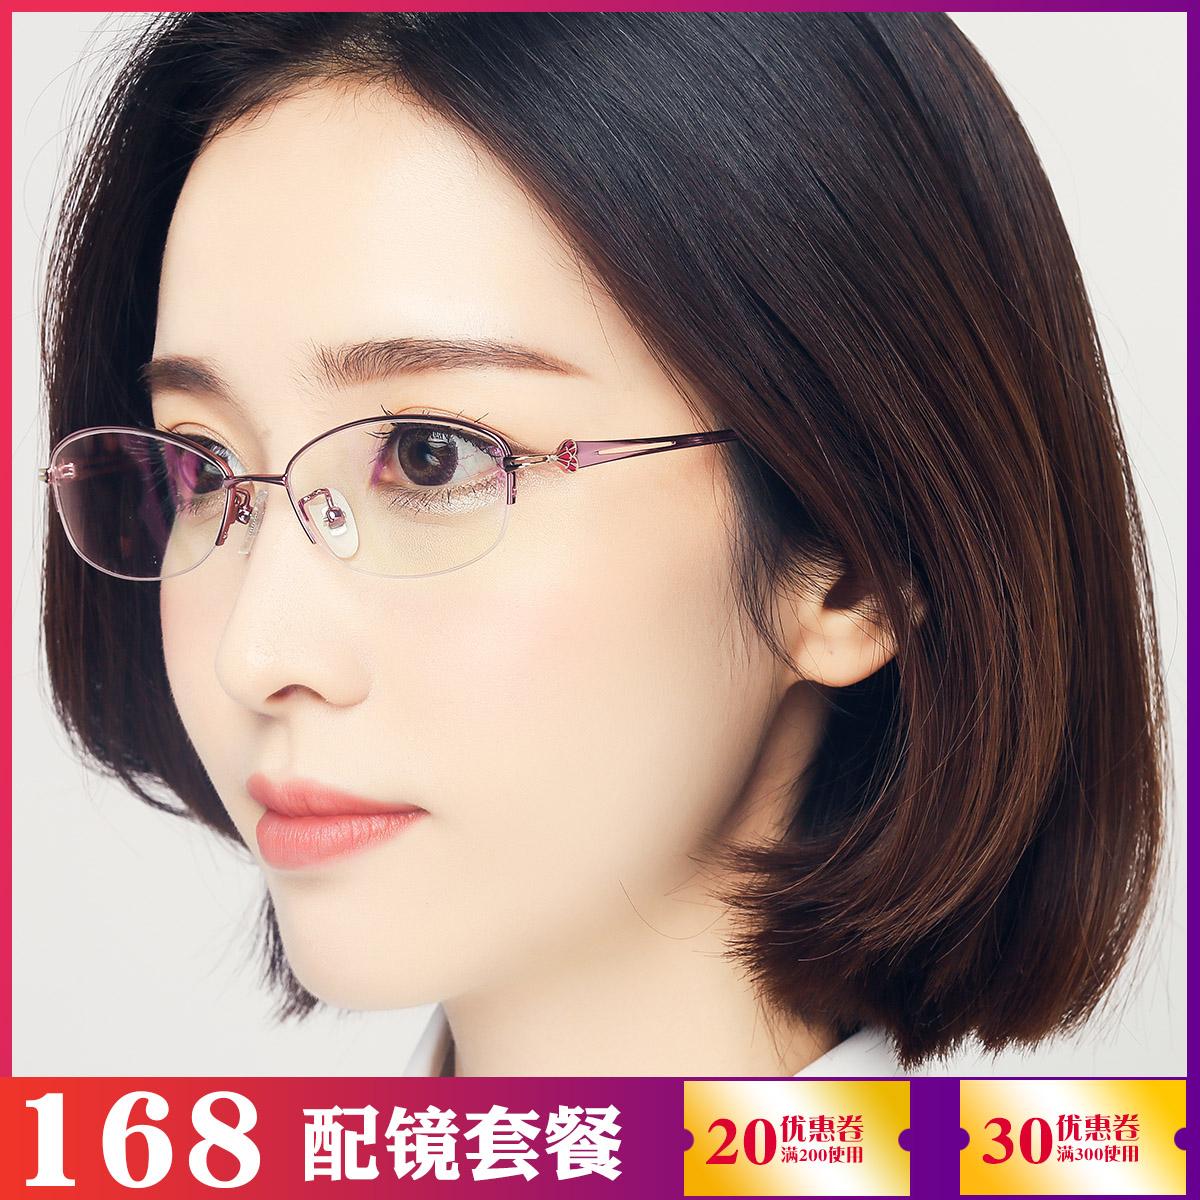 e3d11031d128 Finished myopia glasses female ultra-light pure titanium glasses frame  female elegant half-frame eye frame female glasses tide